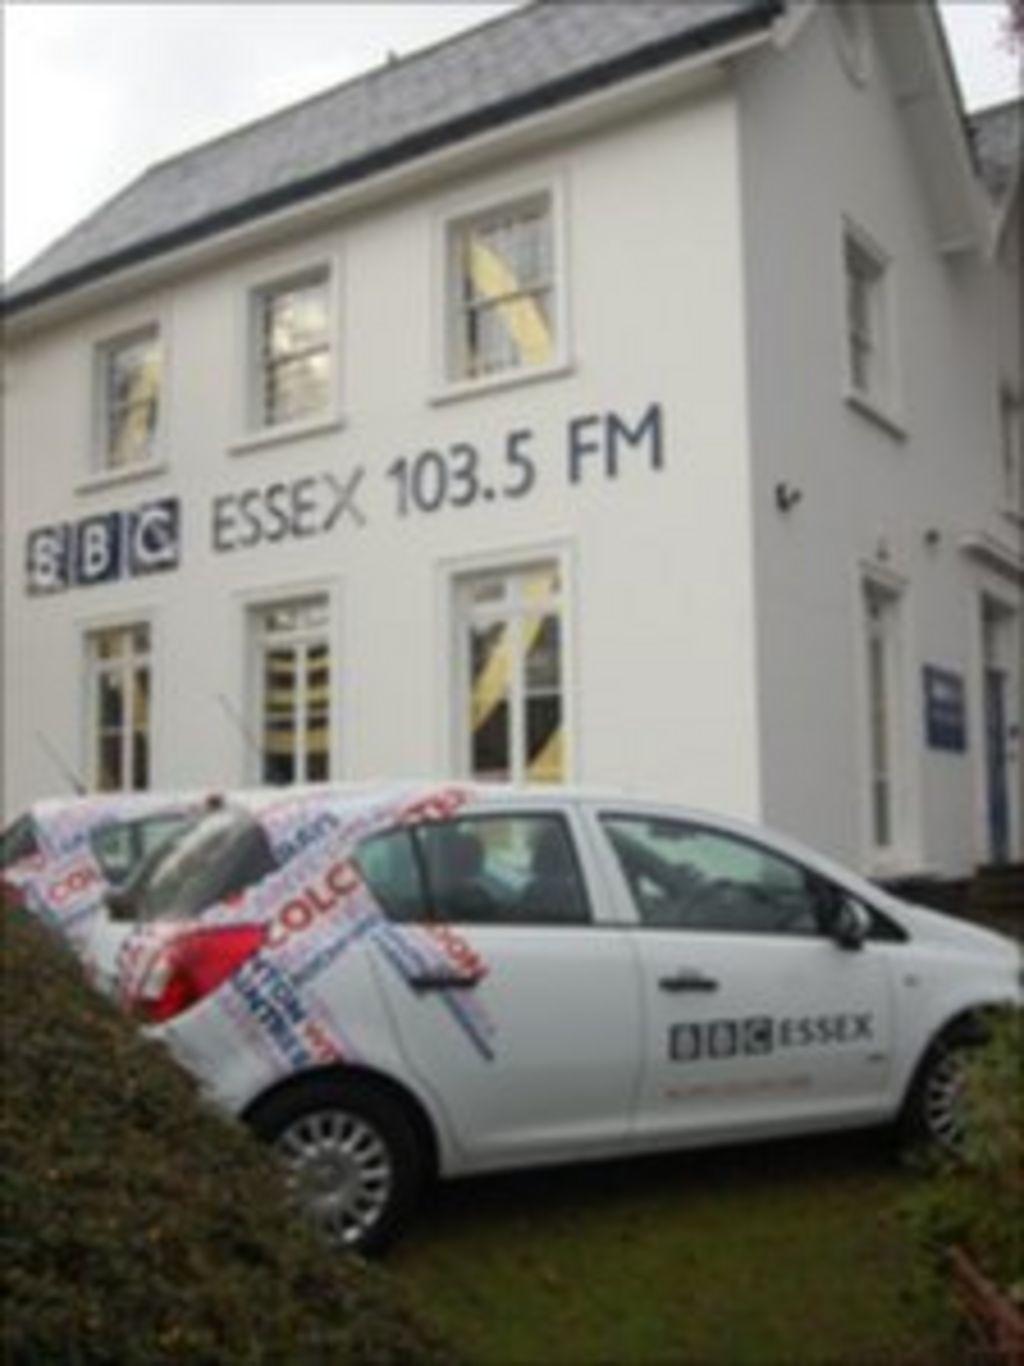 BBC Essex - Wikipedia